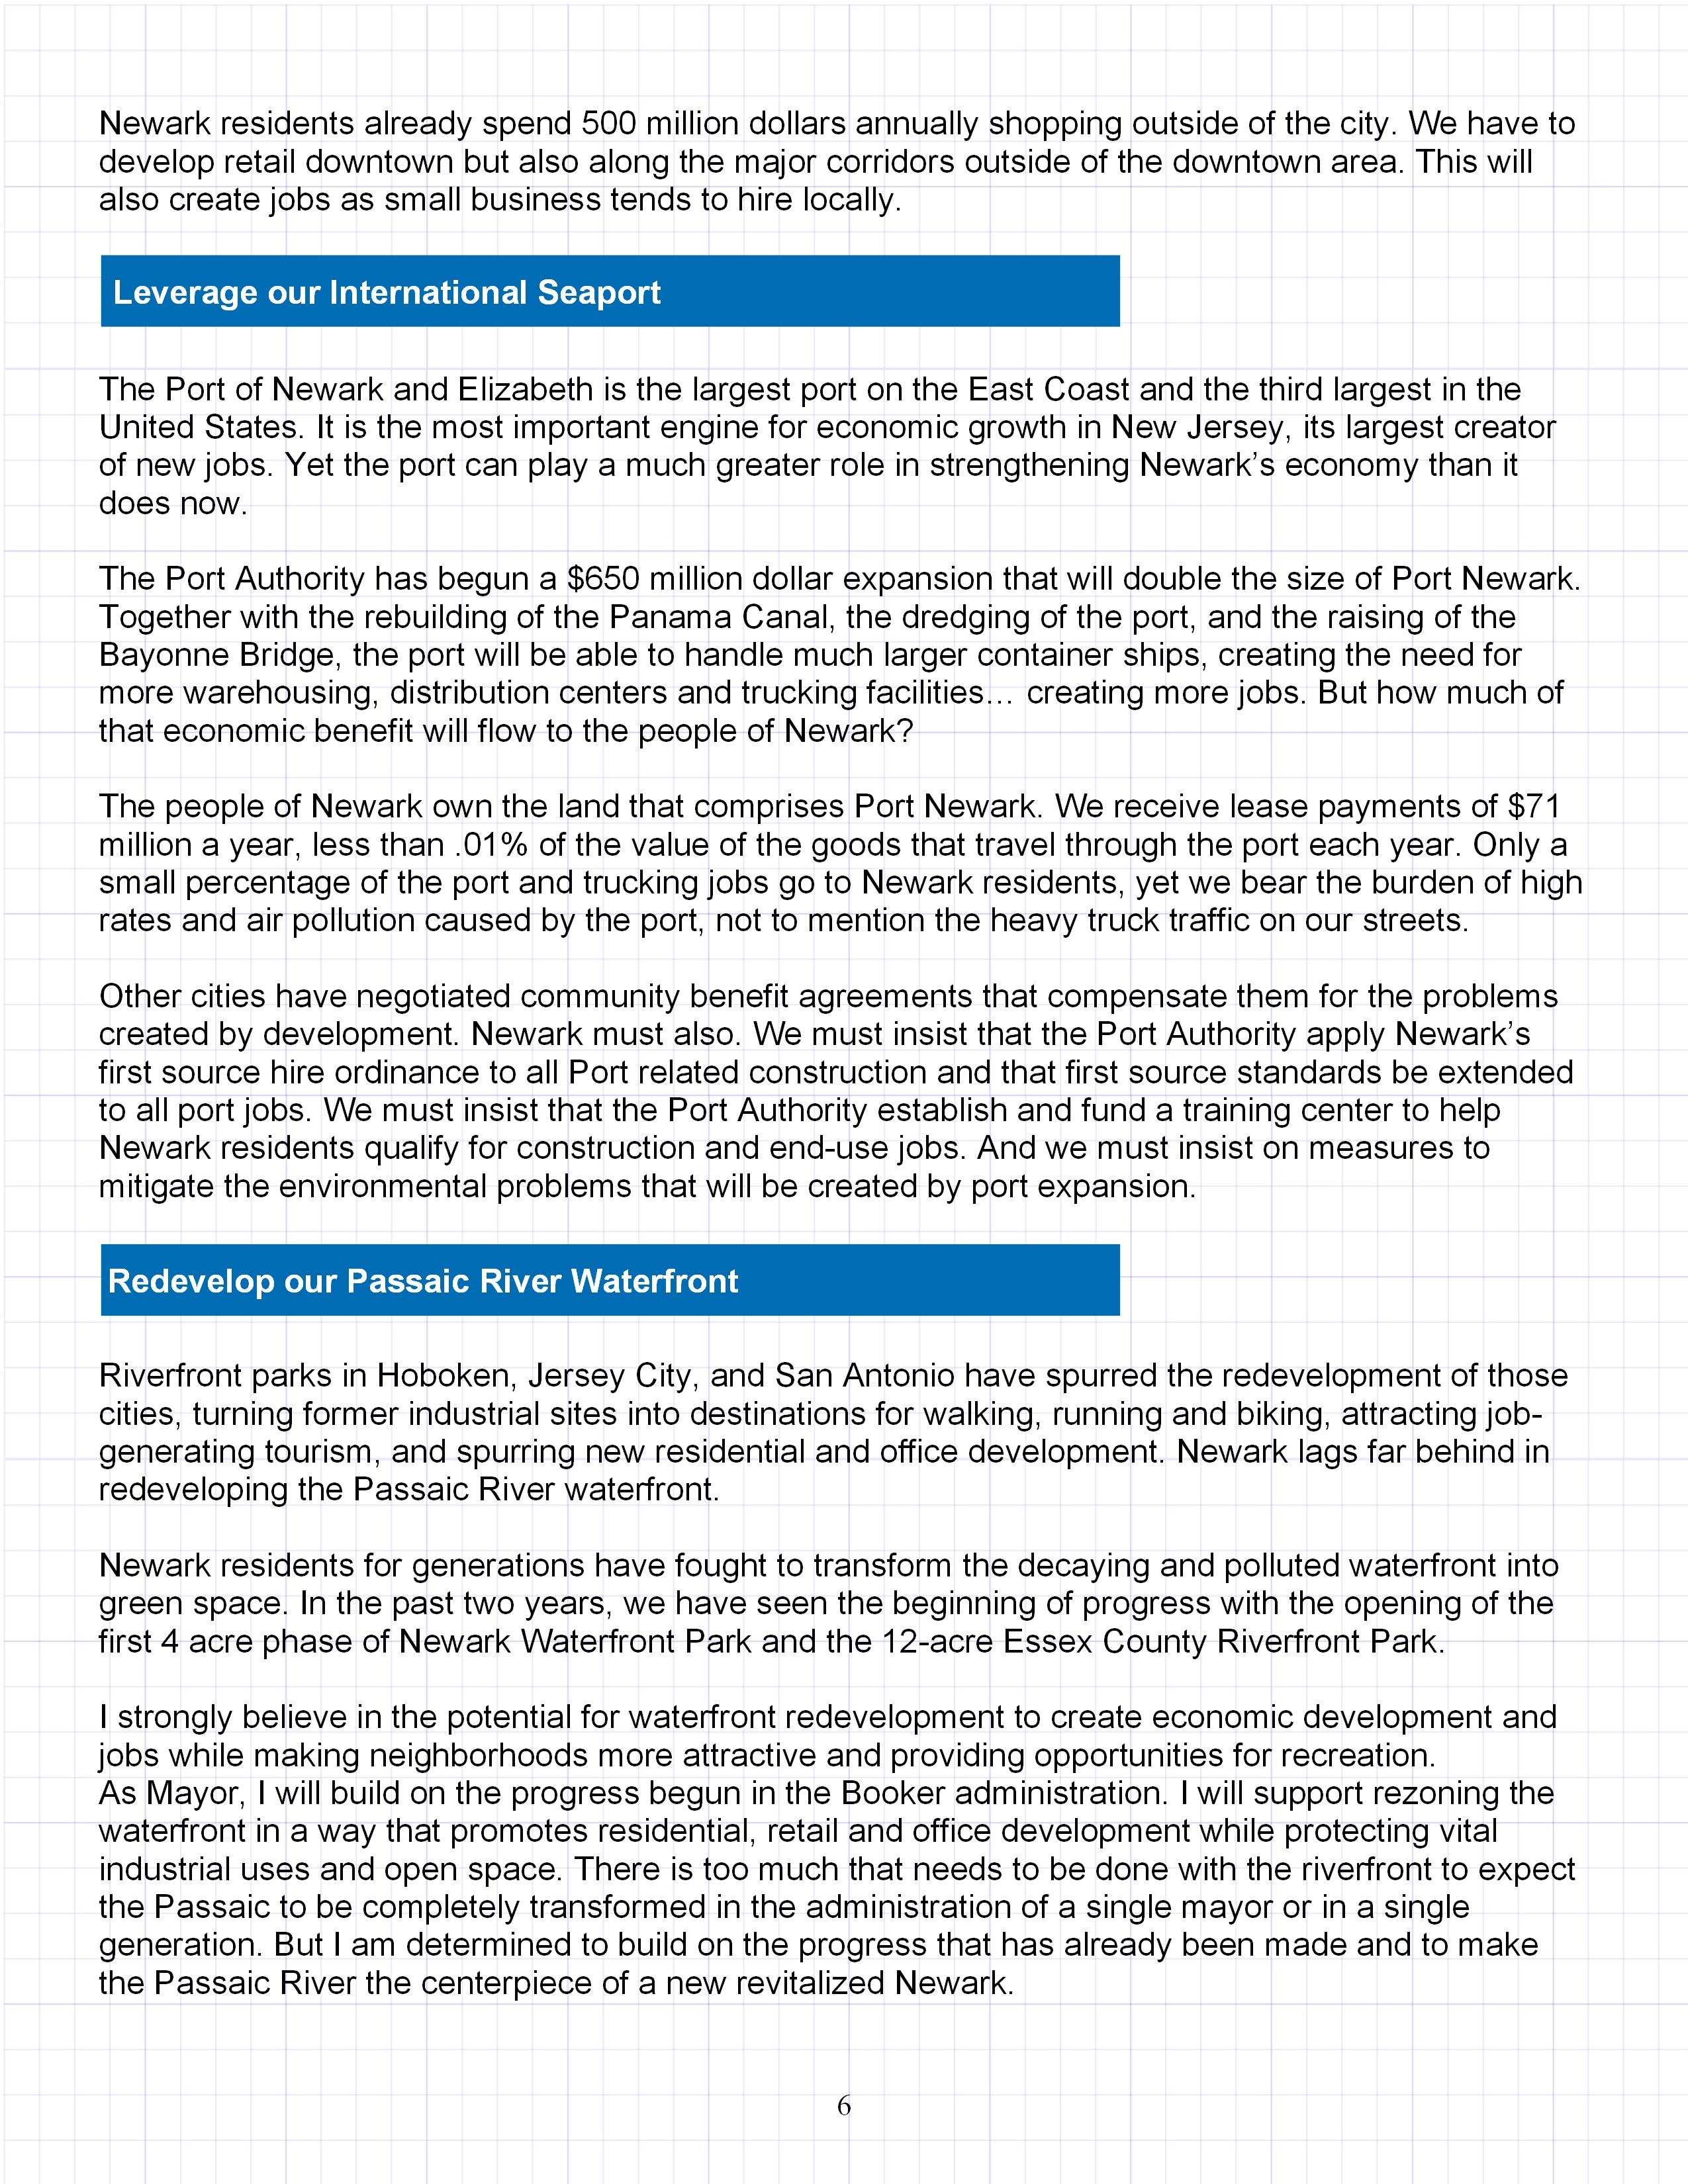 jobs the ras baraka blueprint for economic development and job creation in newark